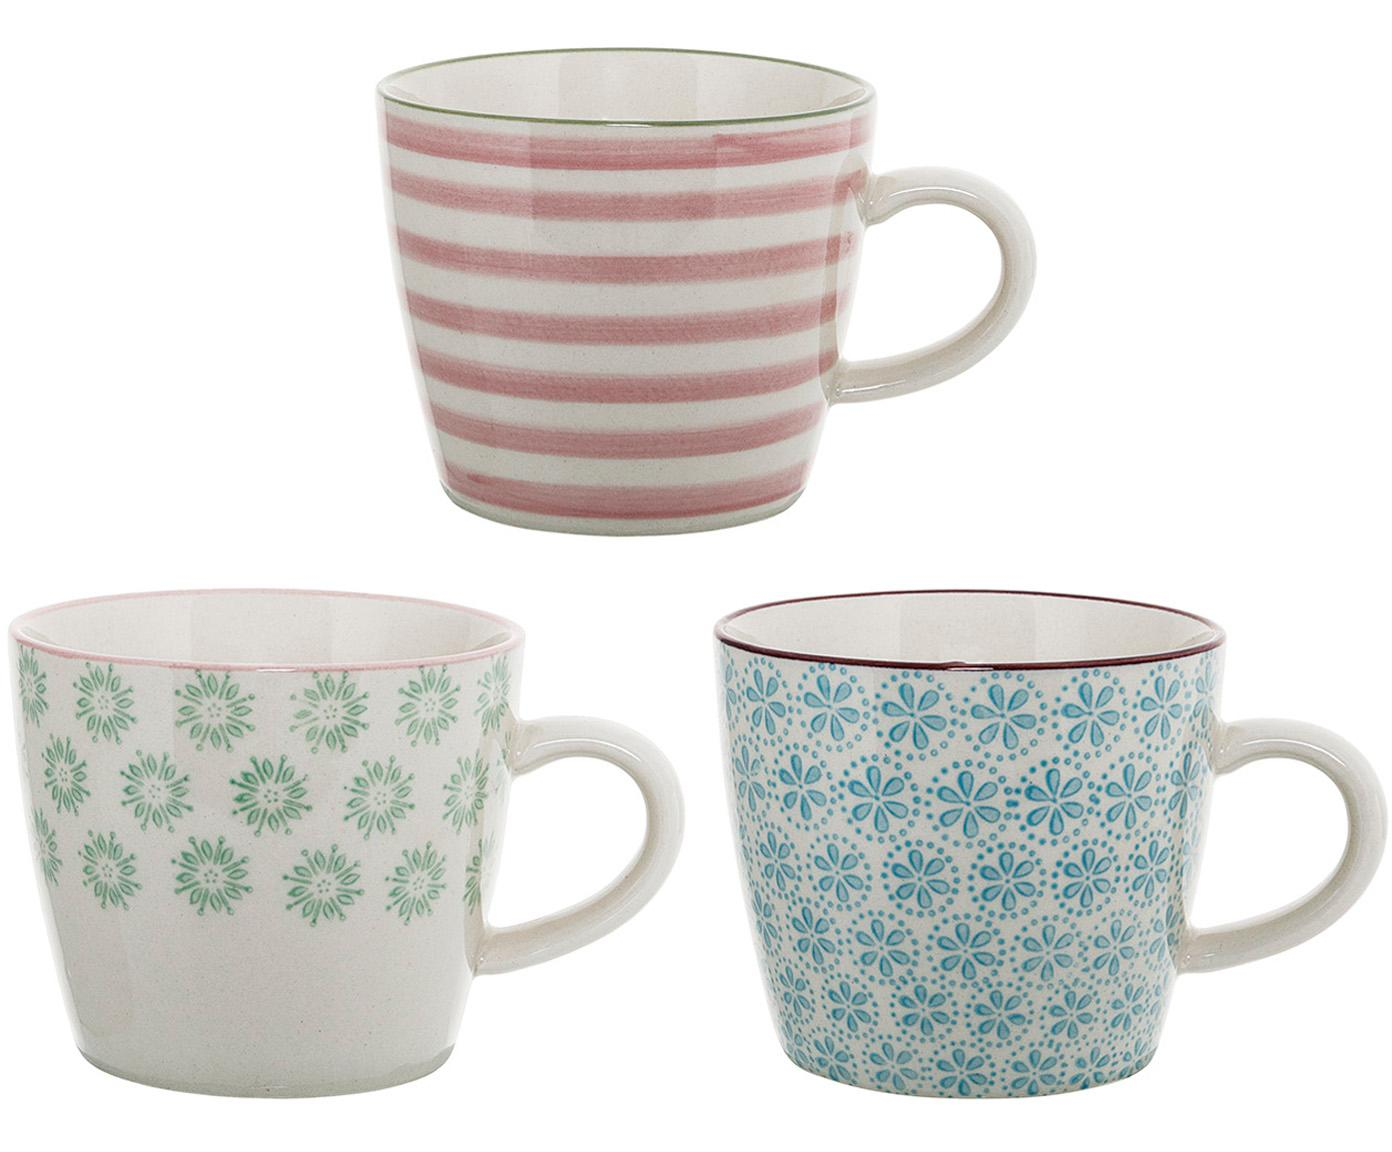 Set 3 tazze Patrizia, Terracotta, Bianco, verde, blu, rosso, Ø 10 x Alt. 8 cm